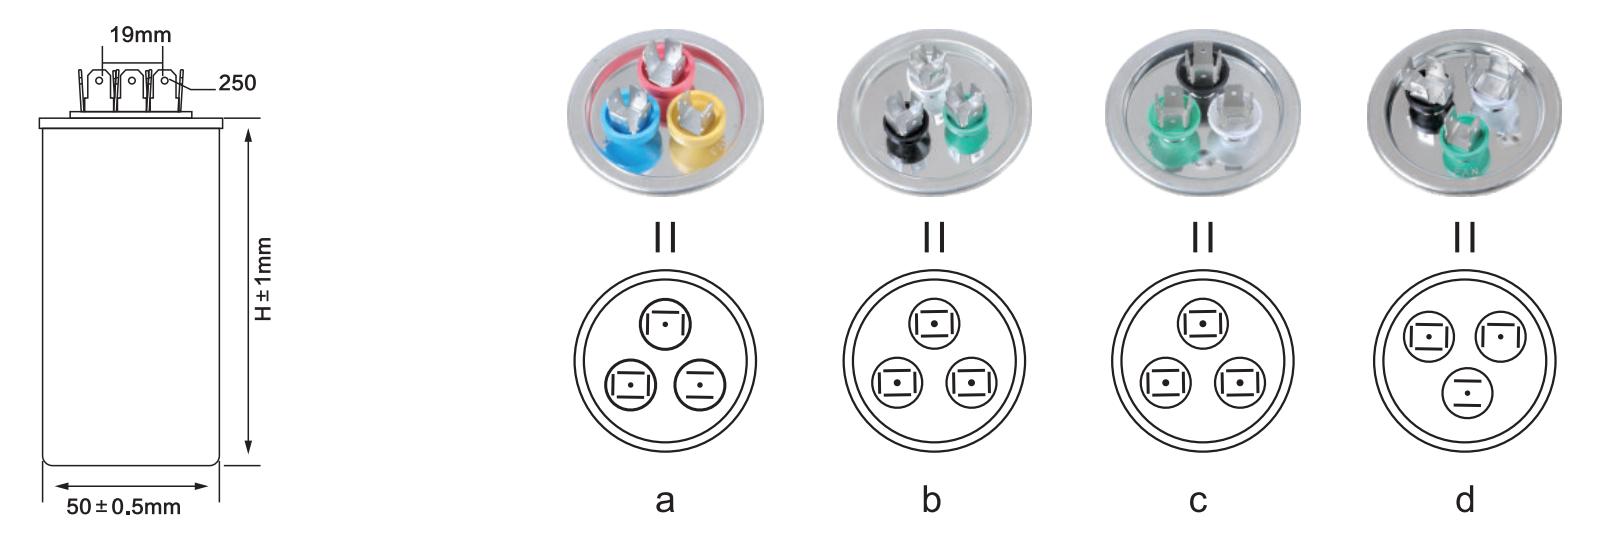 cbb65 capacitor for air-conditioner anatomy